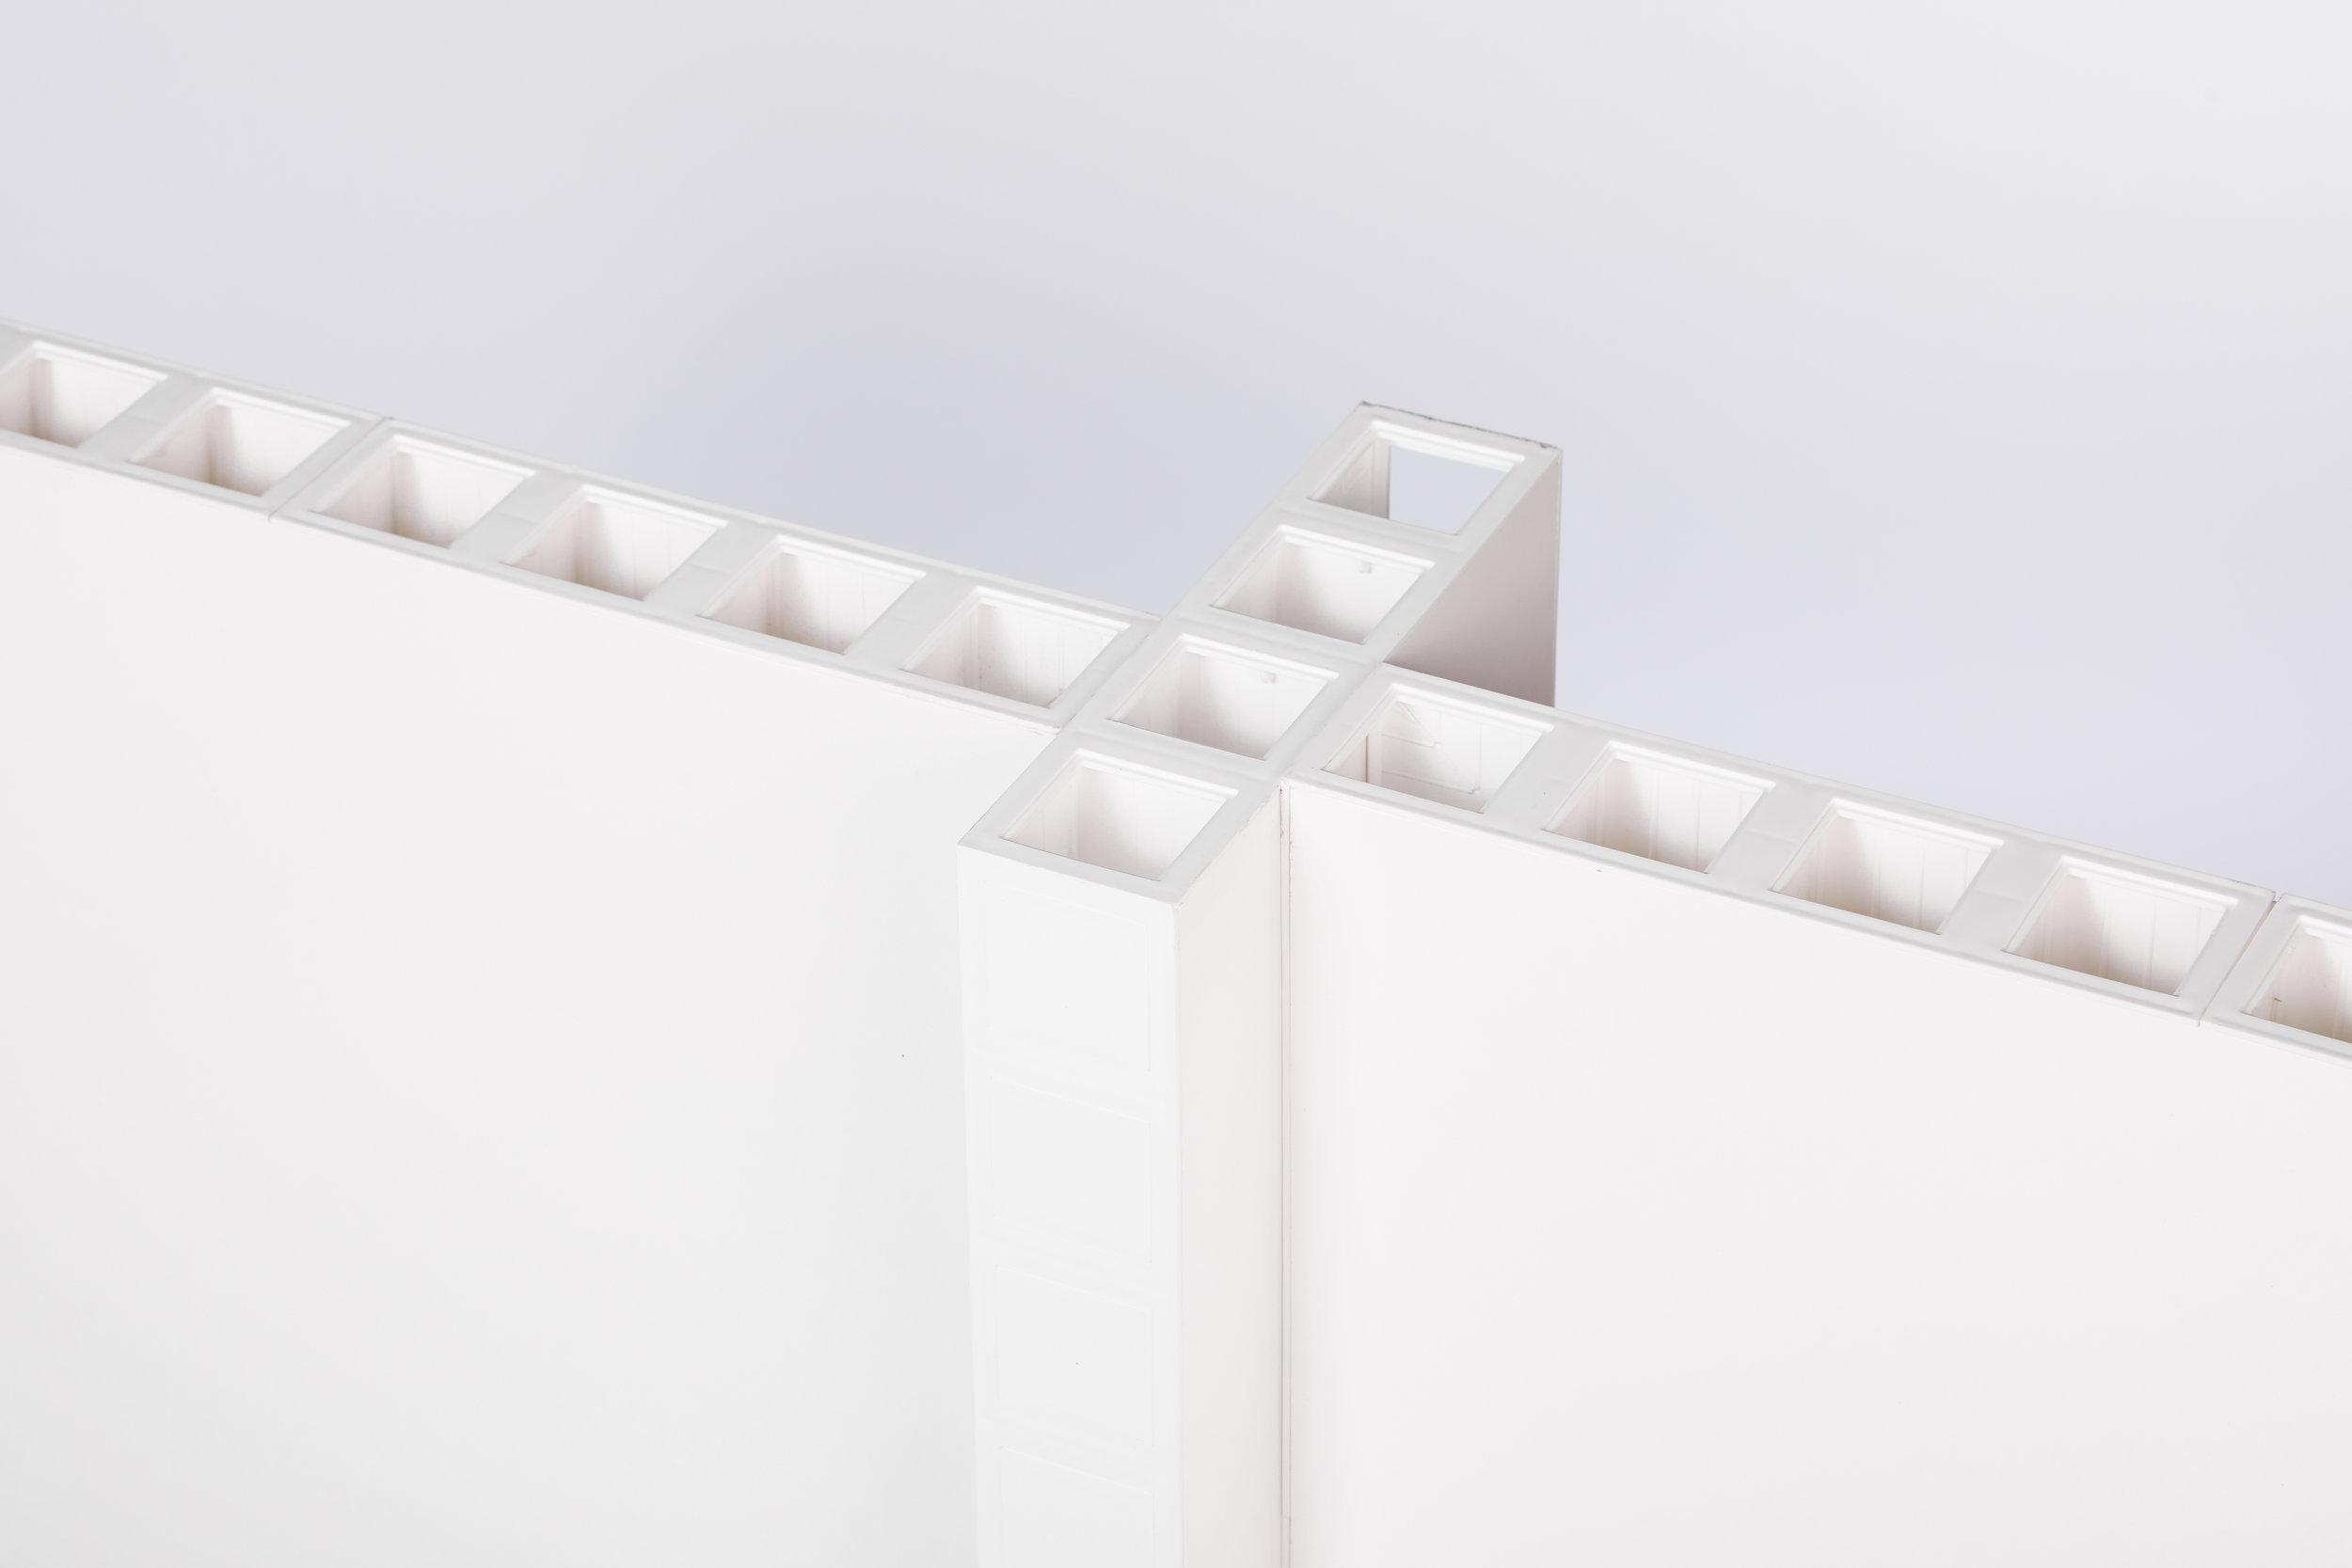 Demountable wall system